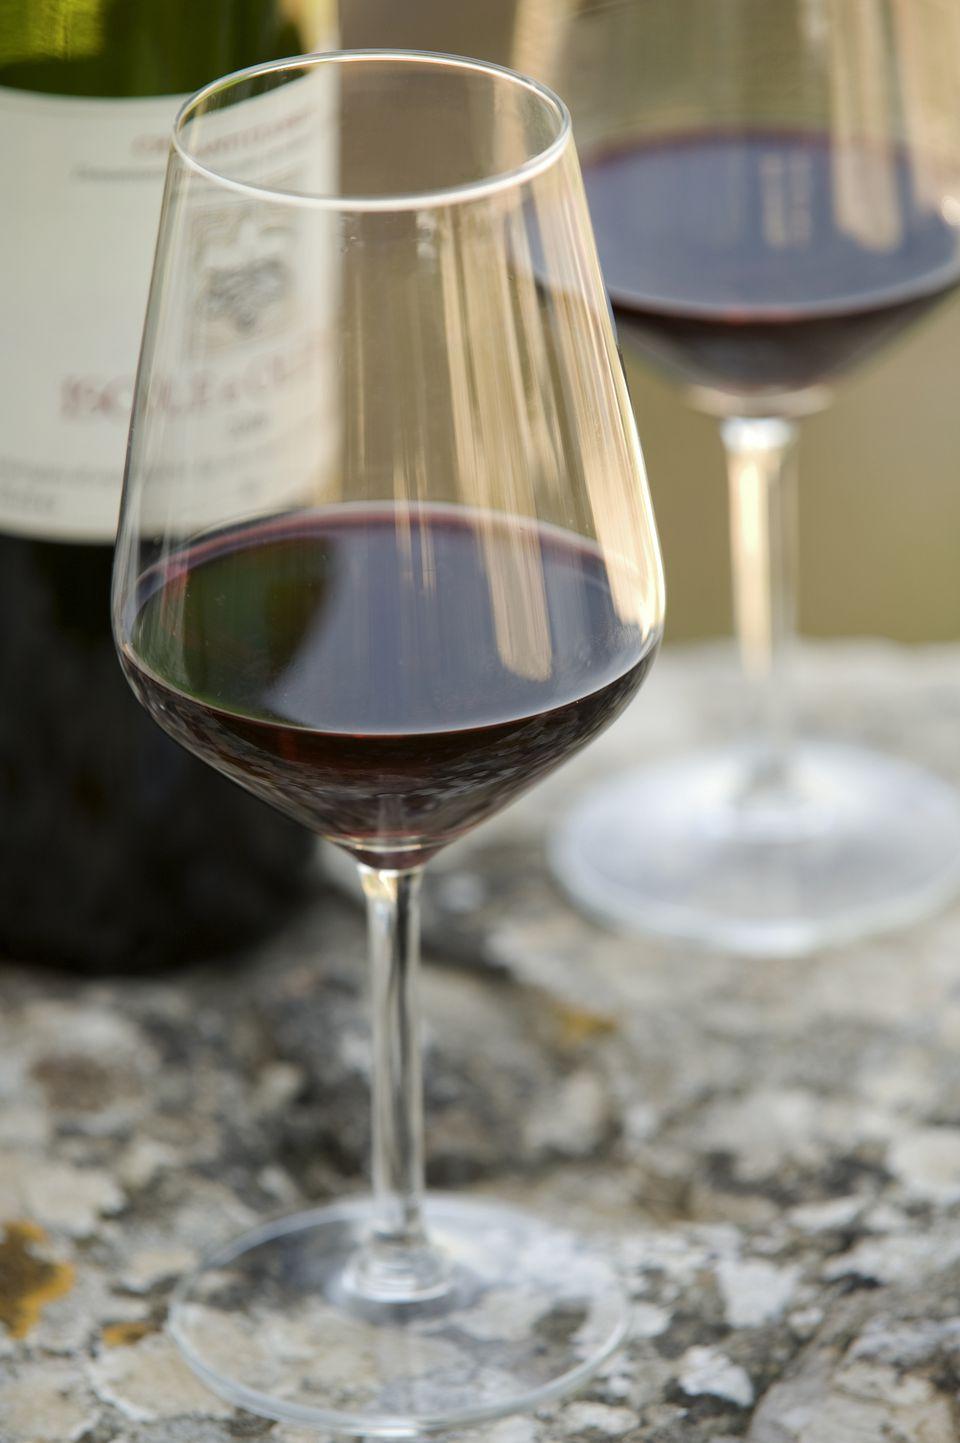 A Chianti Classico from Isole e Olena winery, Tuscany